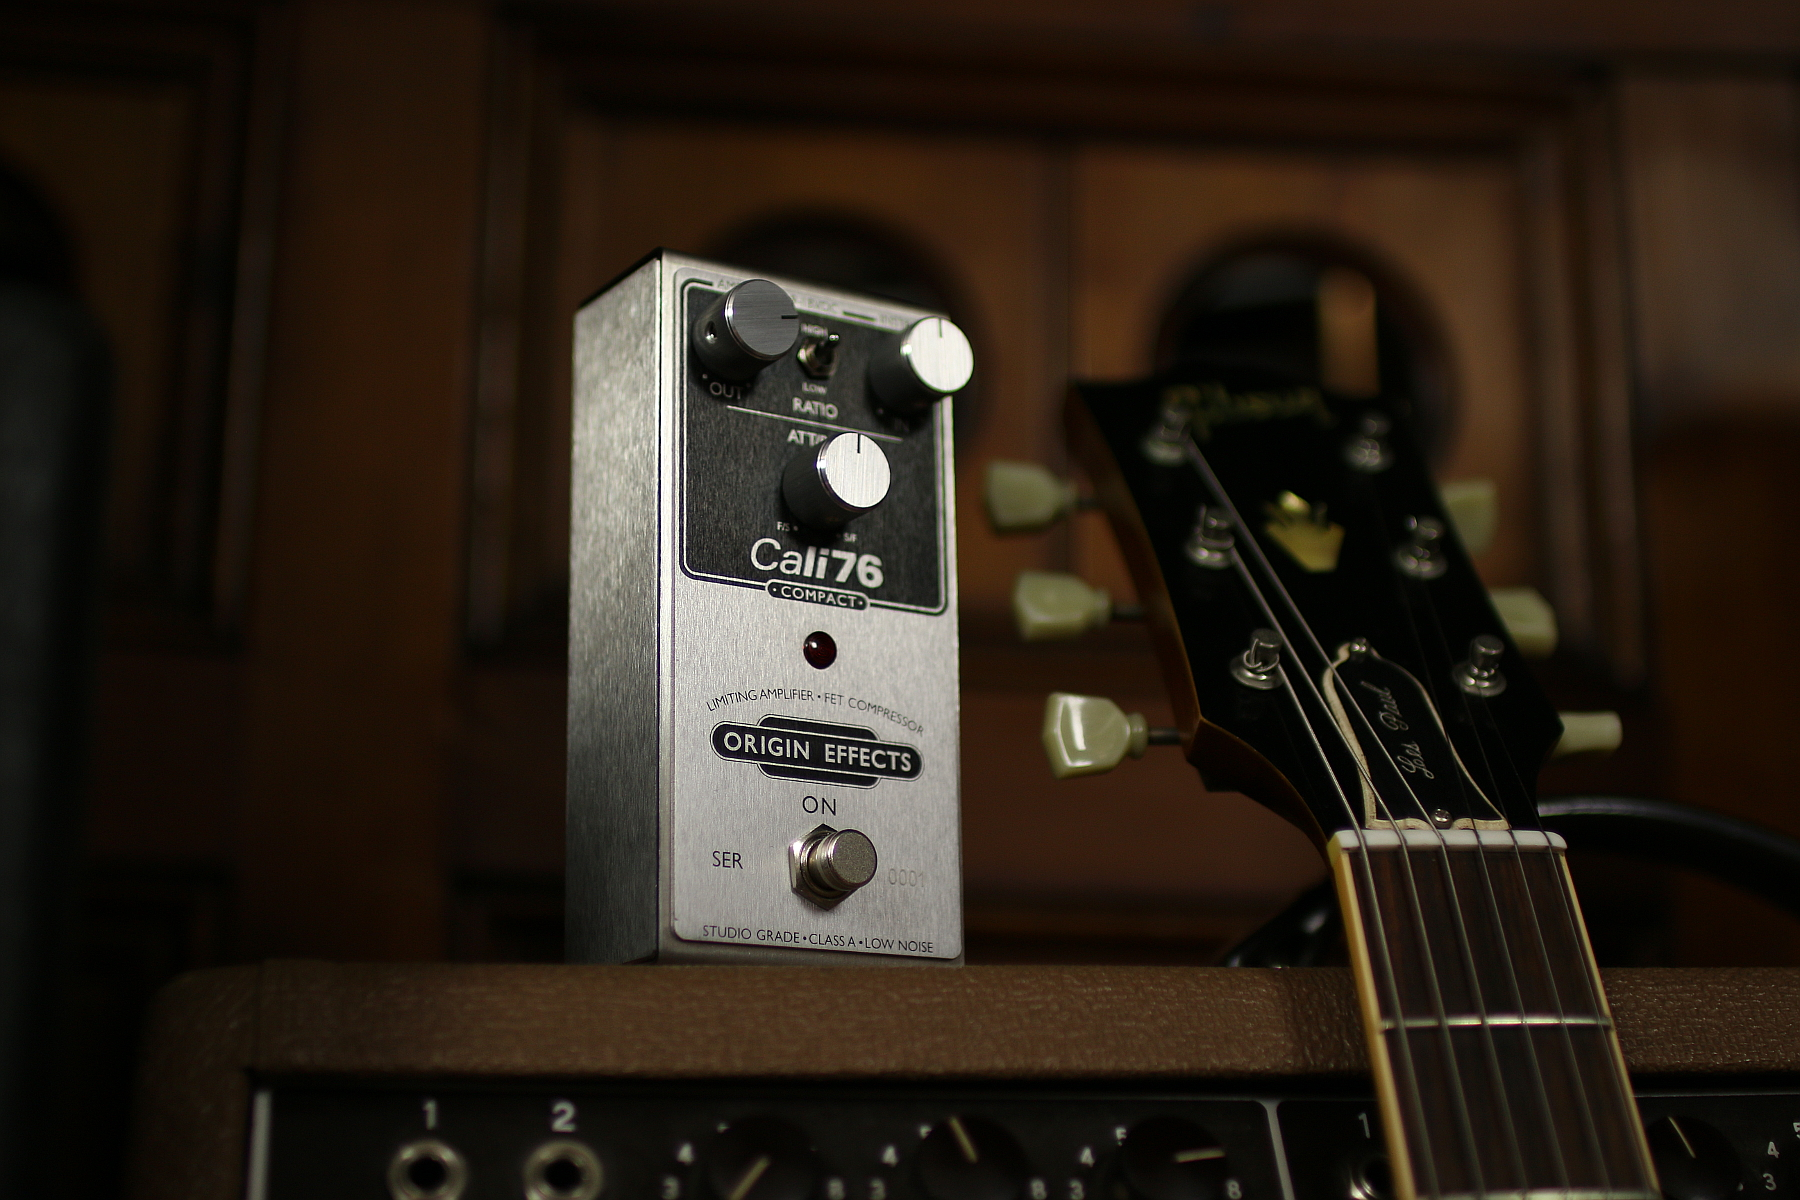 Origin Effects Cali76-C with SG and Fender Super Compact Compressor Boutique Handbuilt